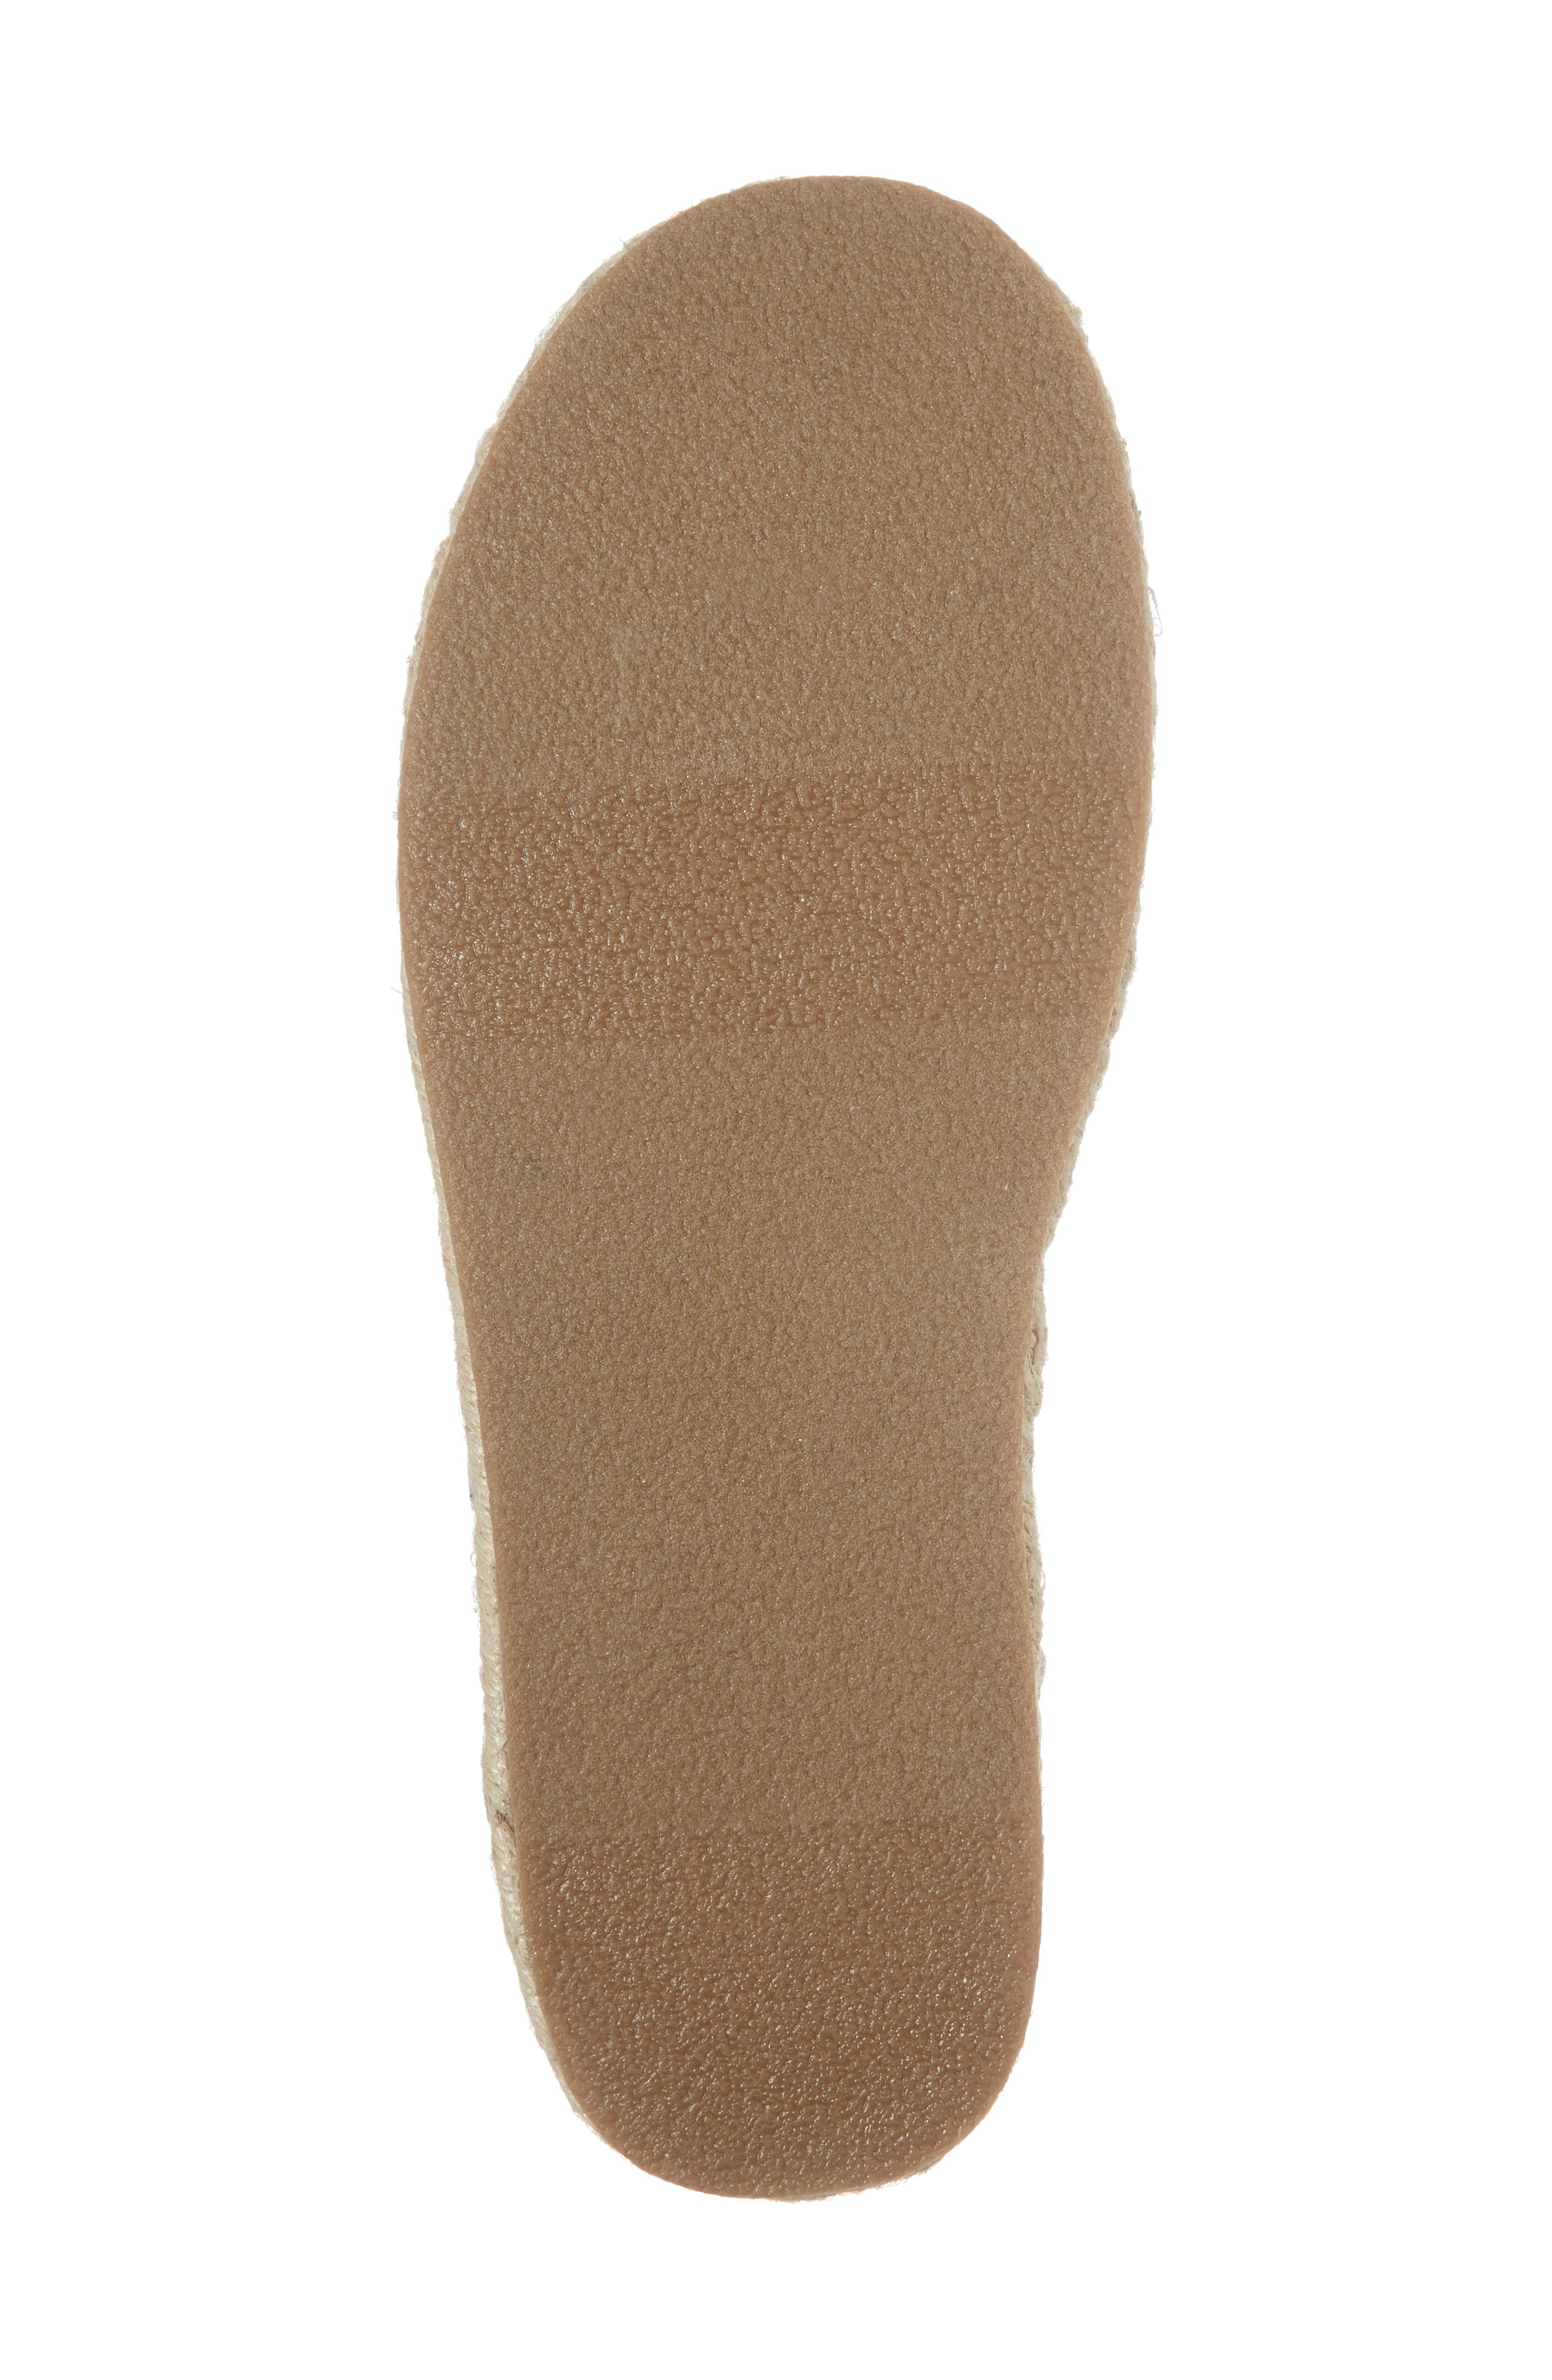 JLUAO Tropical Embellished Sandal,                             Alternate thumbnail 6, color,                             001